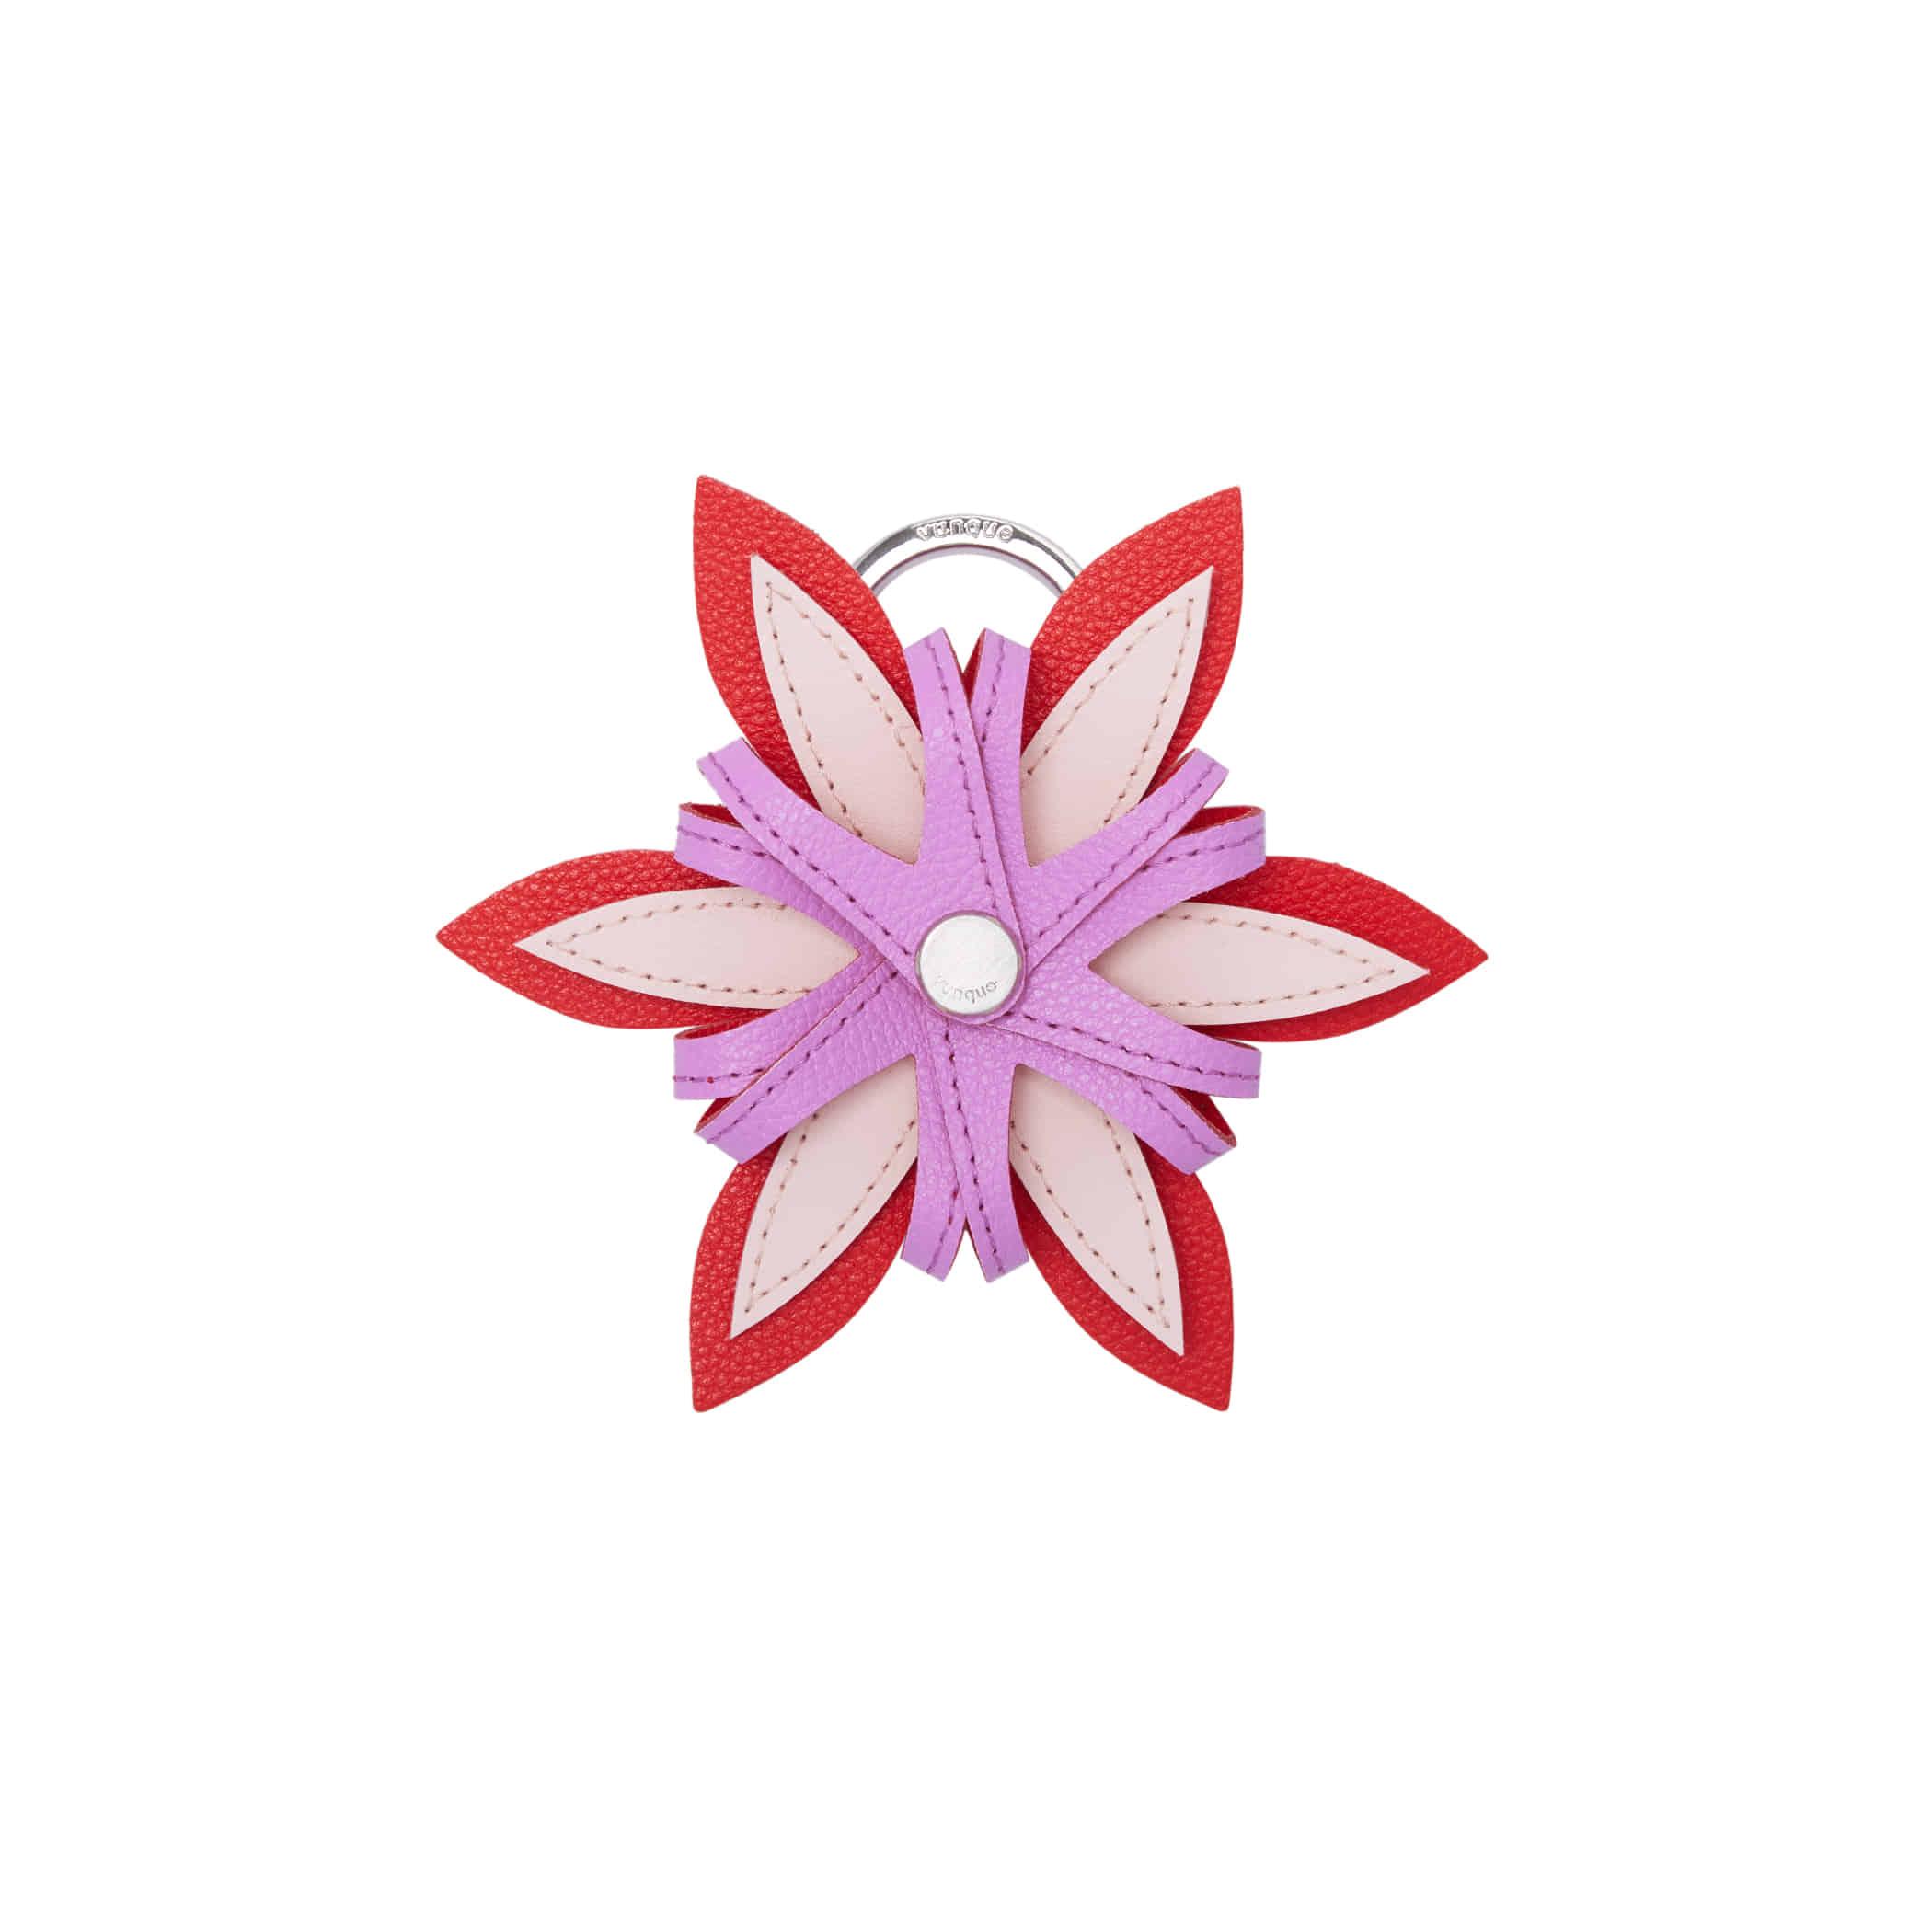 Fexagon Charm (펙사곤 참) Pink lux